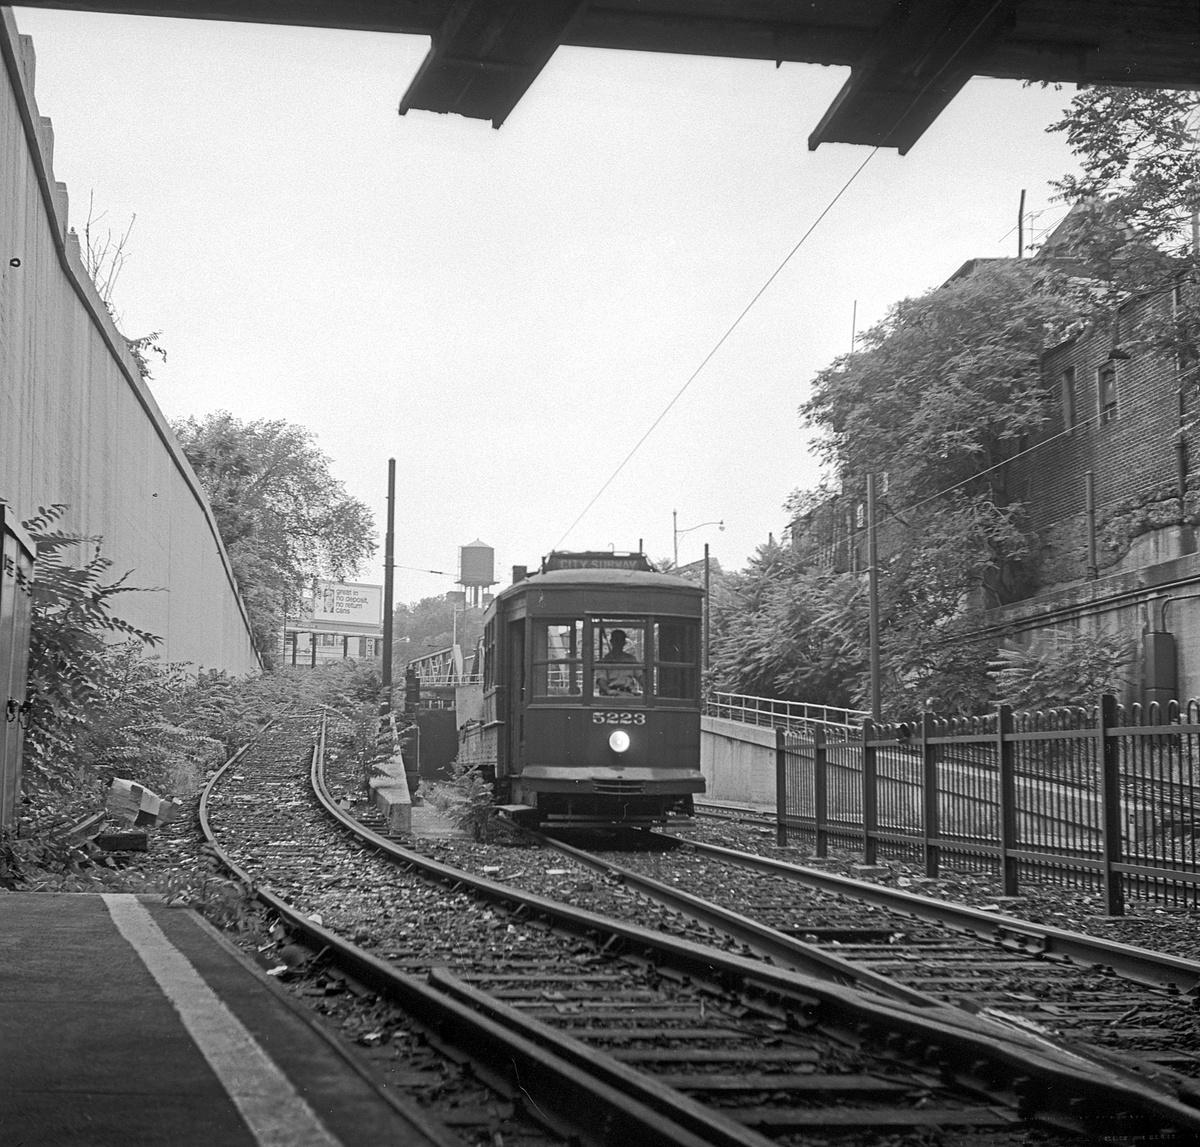 (596k, 1200x1147)<br><b>Country:</b> United States<br><b>City:</b> Newark, NJ<br><b>System:</b> Newark City Subway<br><b>Location:</b> Norfolk Street<br><b>Car:</b>  5223 <br><b>Collection of:</b> David Pirmann<br><b>Date:</b> 7/5/1965<br><b>Viewed (this week/total):</b> 1 / 102